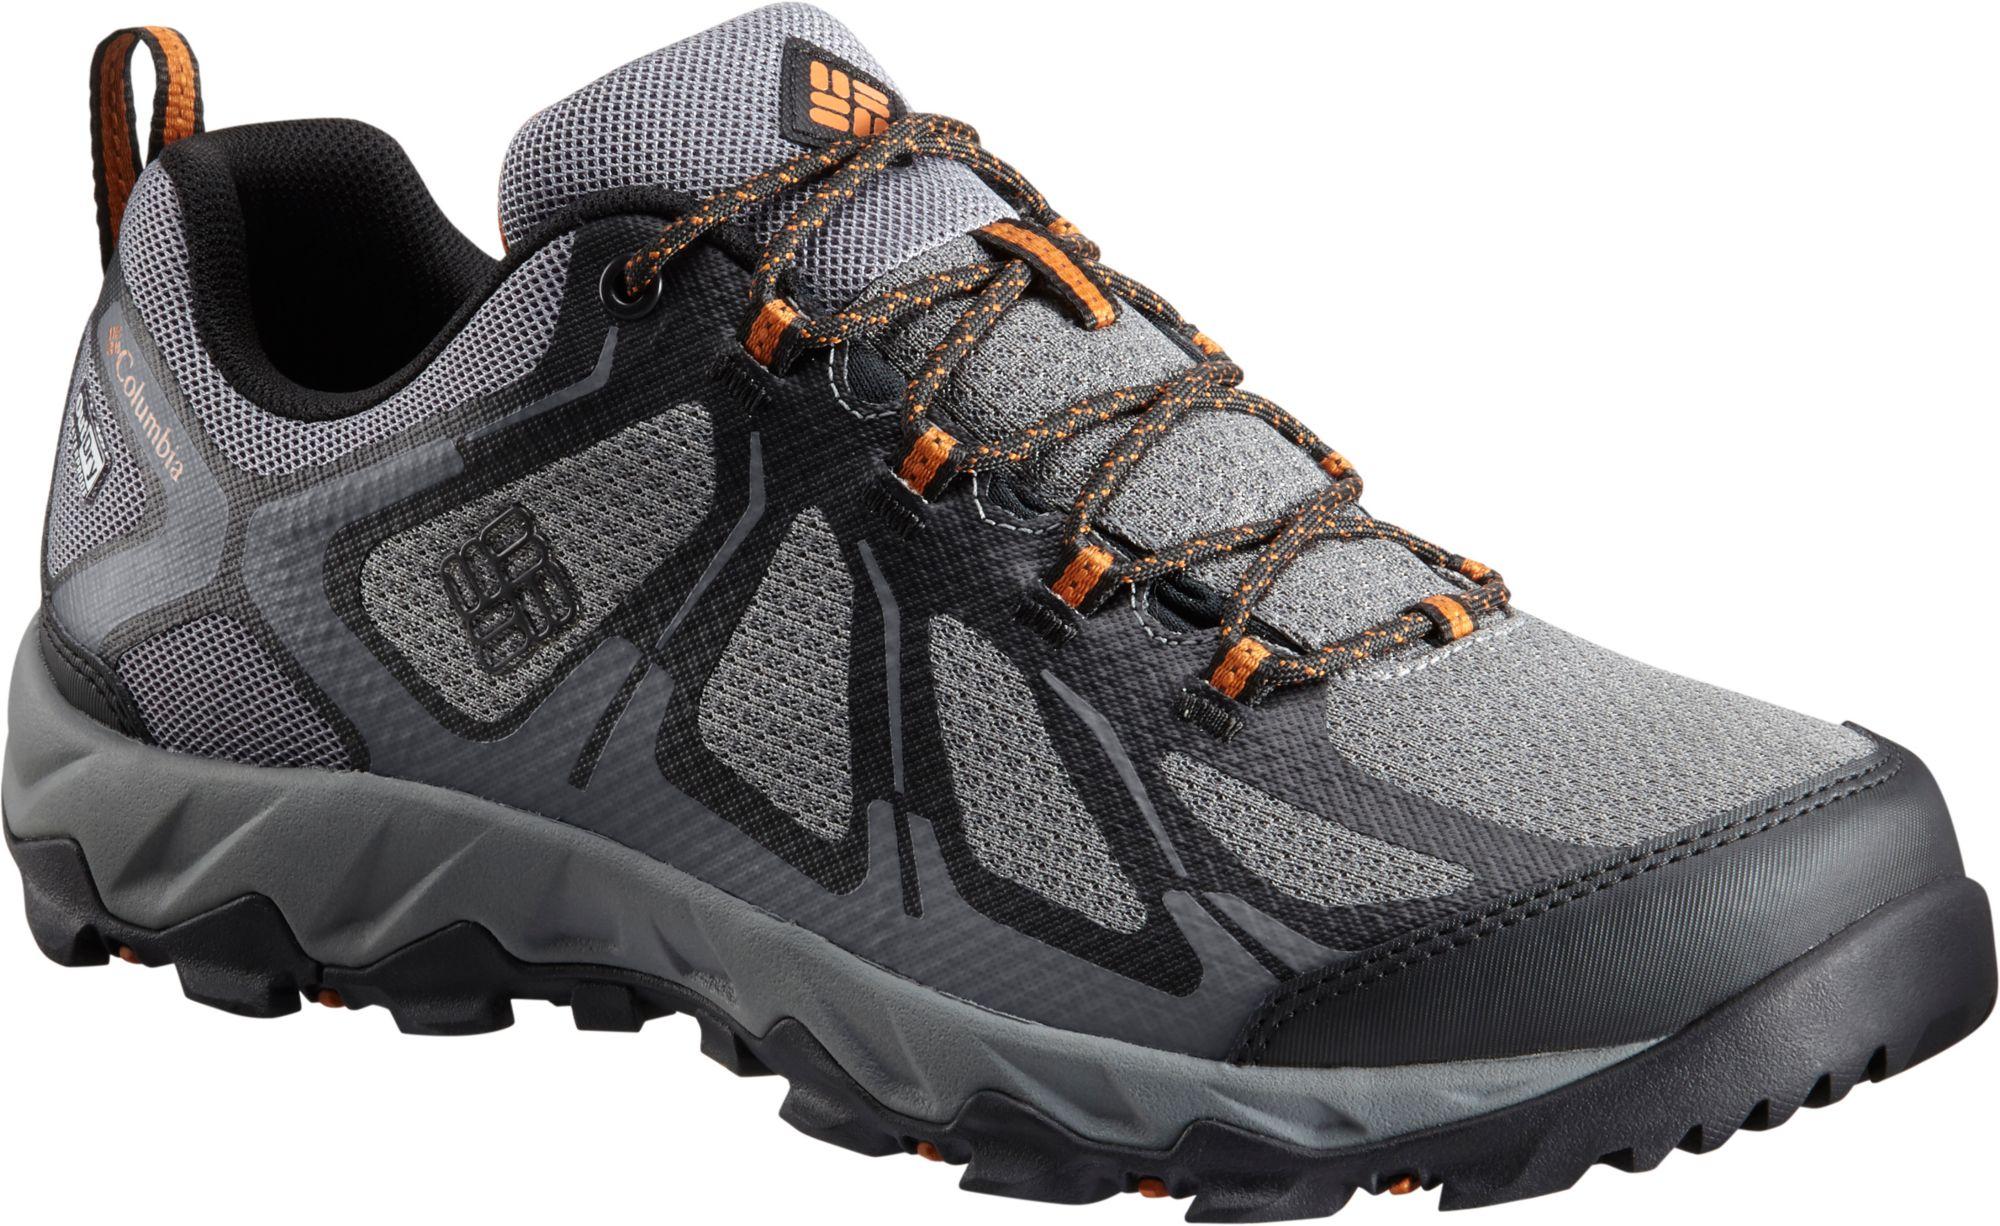 adb0199c3a5 Columbia Men's Peakfreak XCRSN II XCEL OutDry Waterproof Hiking Shoes